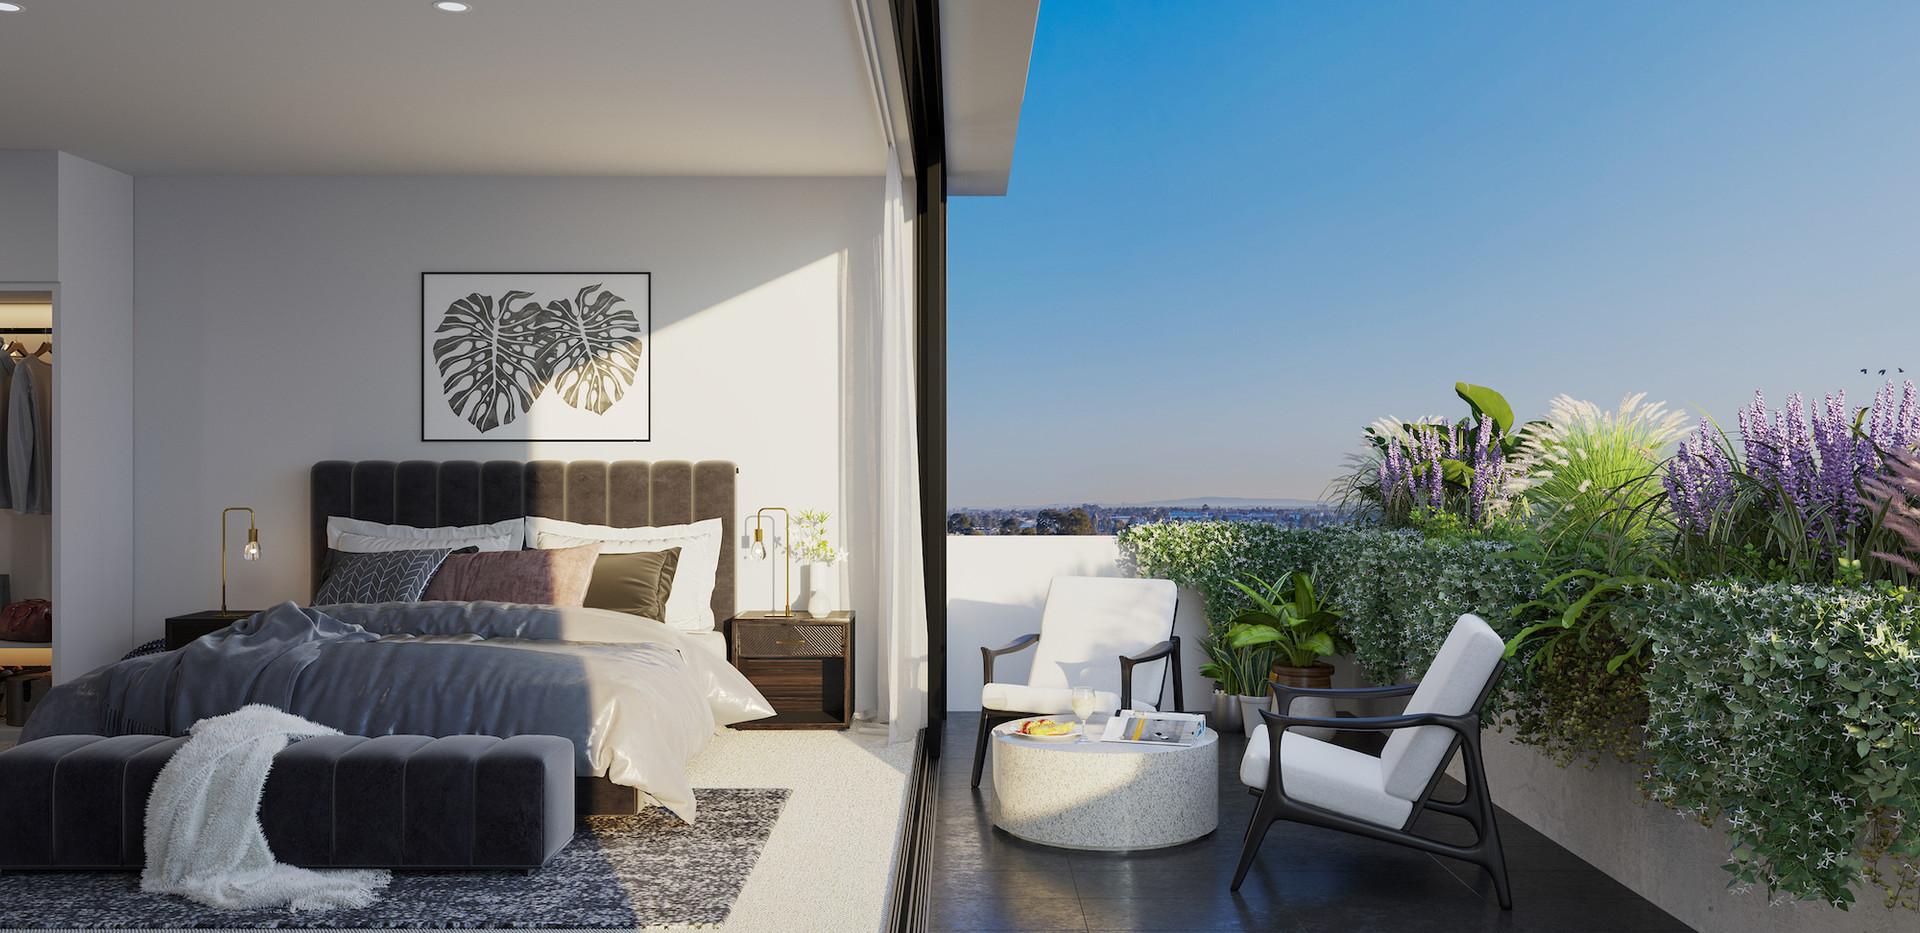 Luda Studios_Bedroom_Balcony_Opt 2_Sml_F